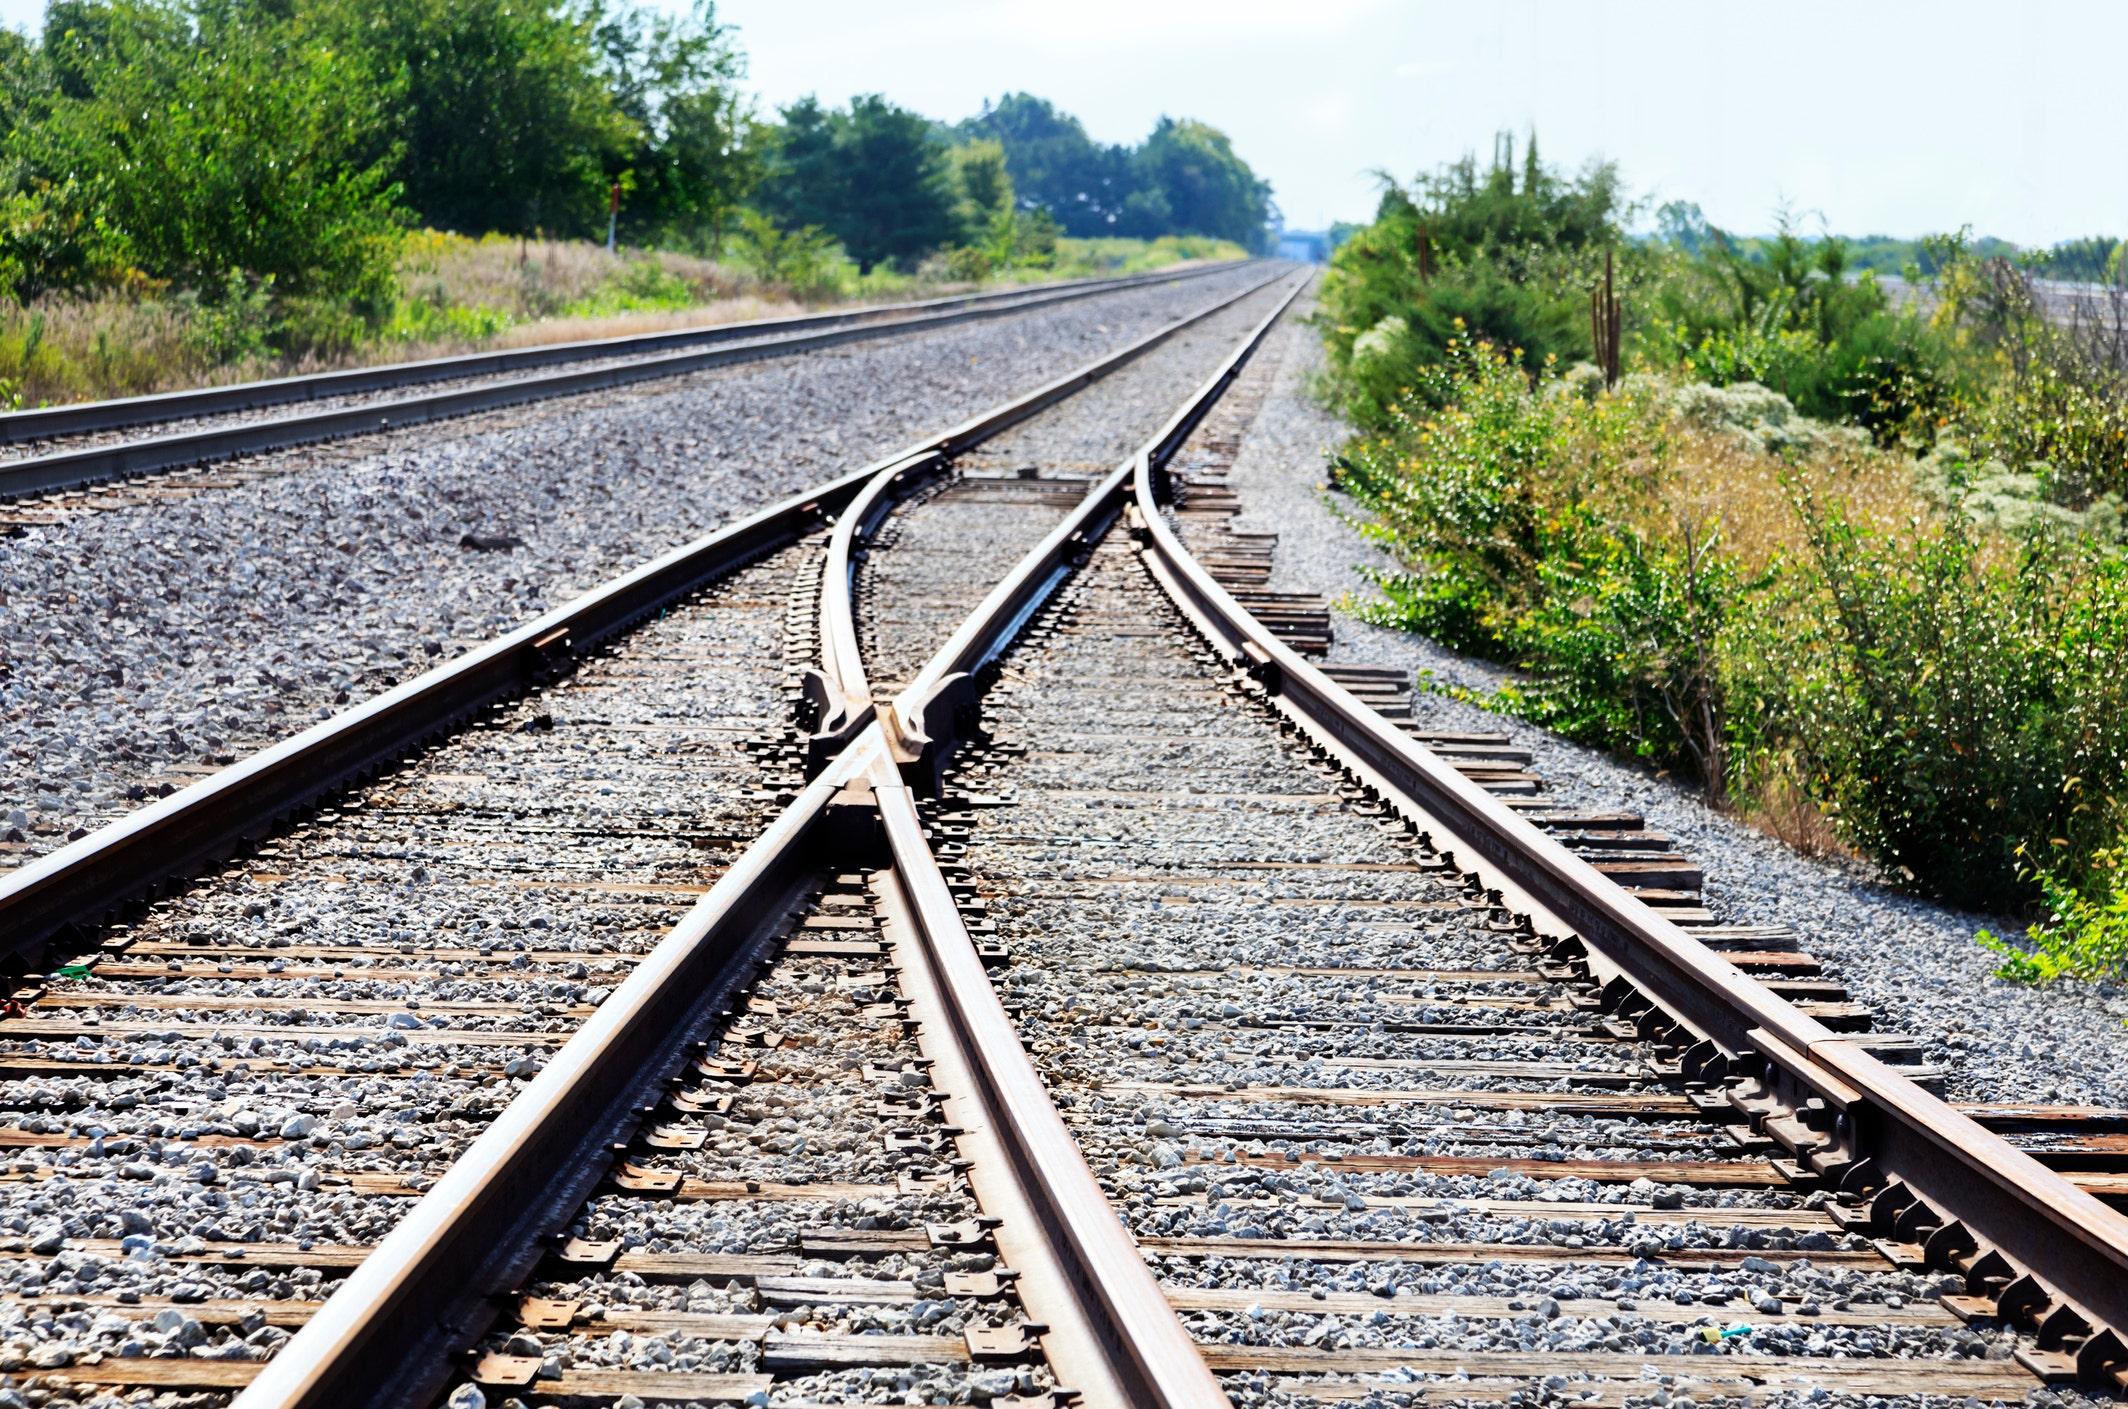 Family taking photos on railroad tracks narrowly escapes train in terrifying video - fox